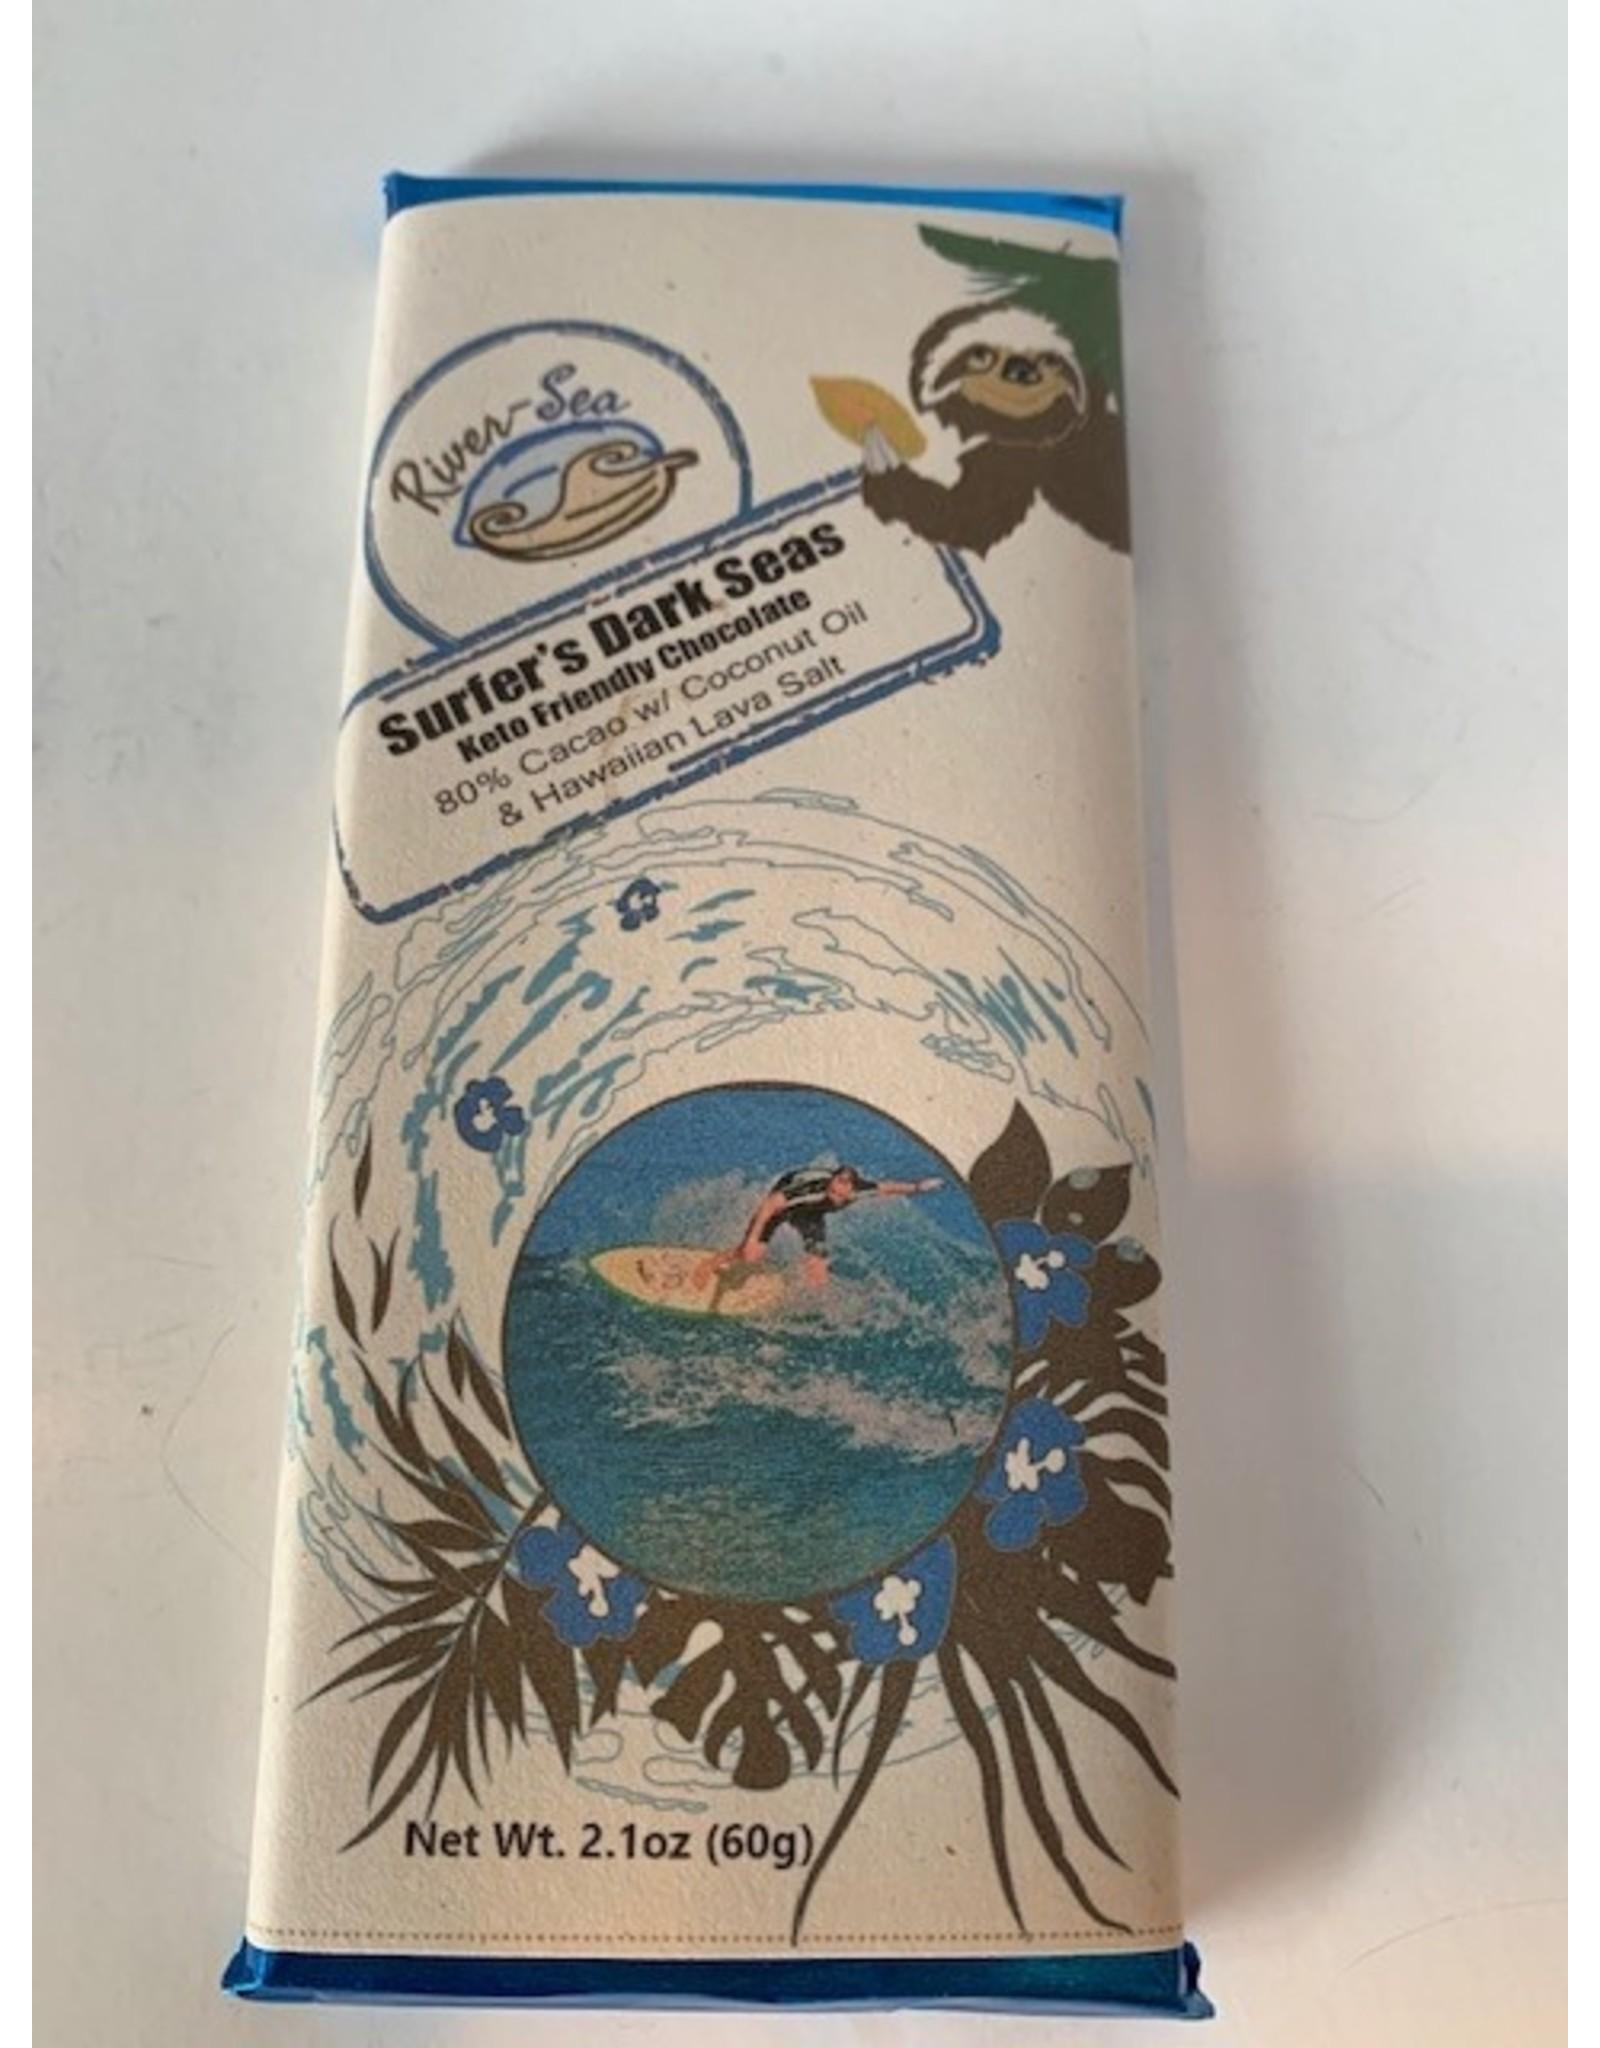 River-Sea Chocolate Surfers Dark Sea